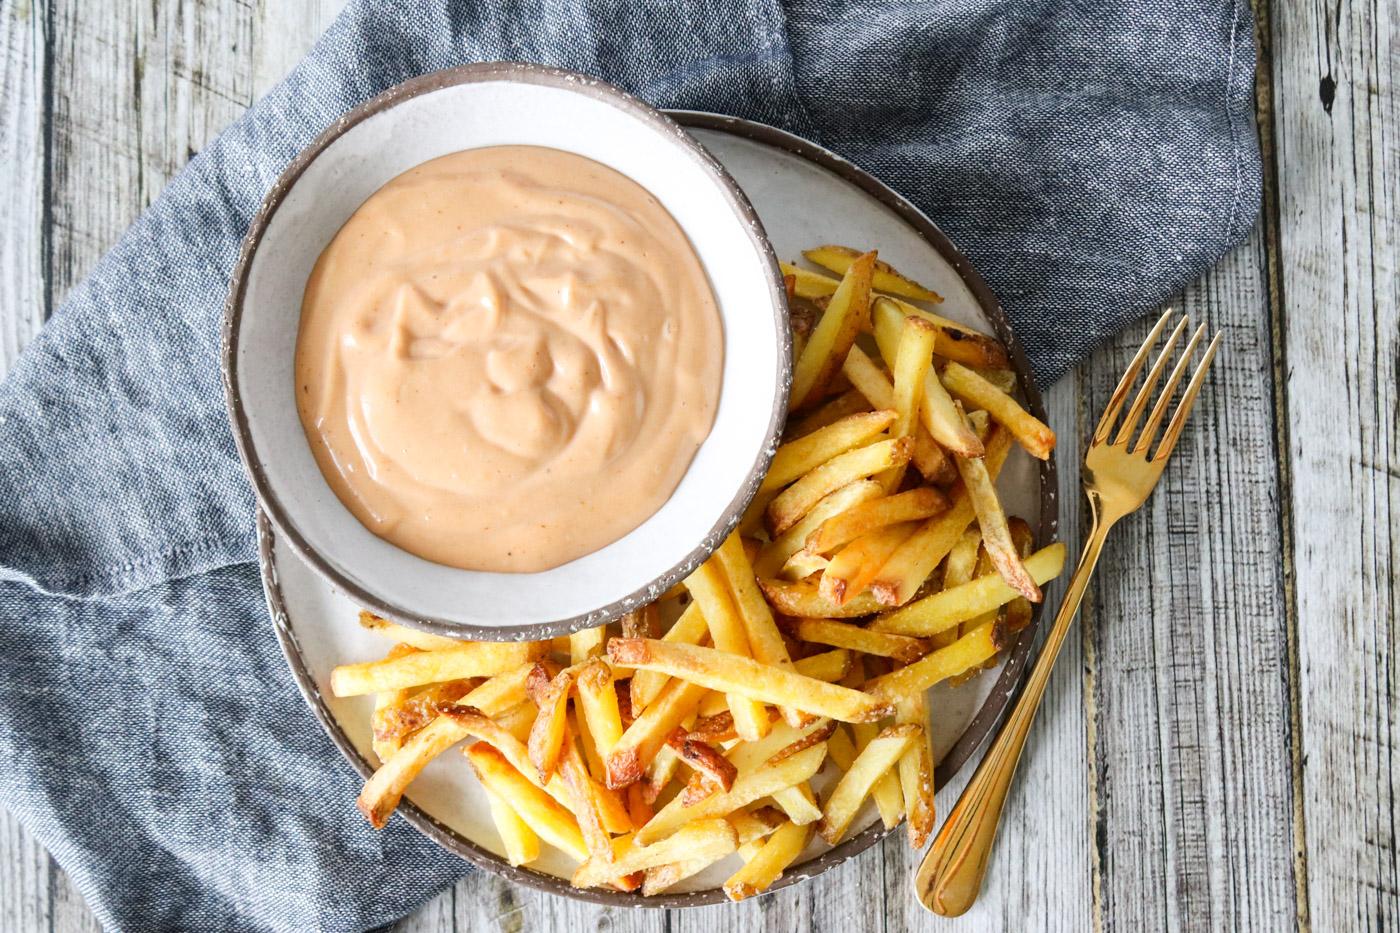 BBQ Mayonnaise På 1 Minut – Hjemmelavet Mayo Med BBQ Sauce